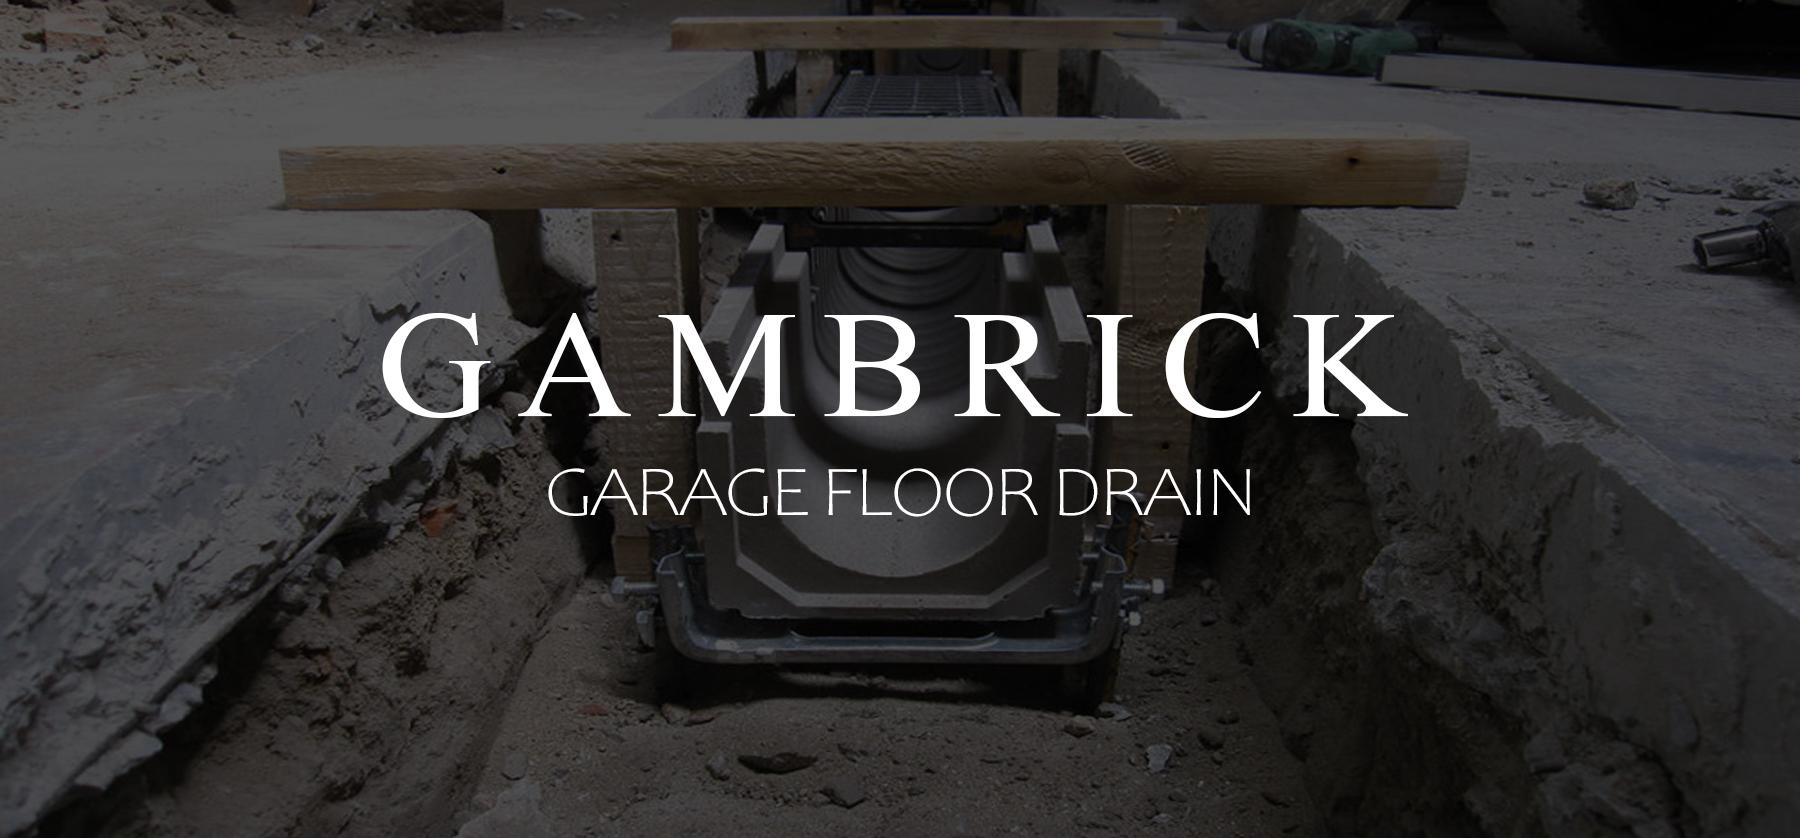 garage floor drain banner pic